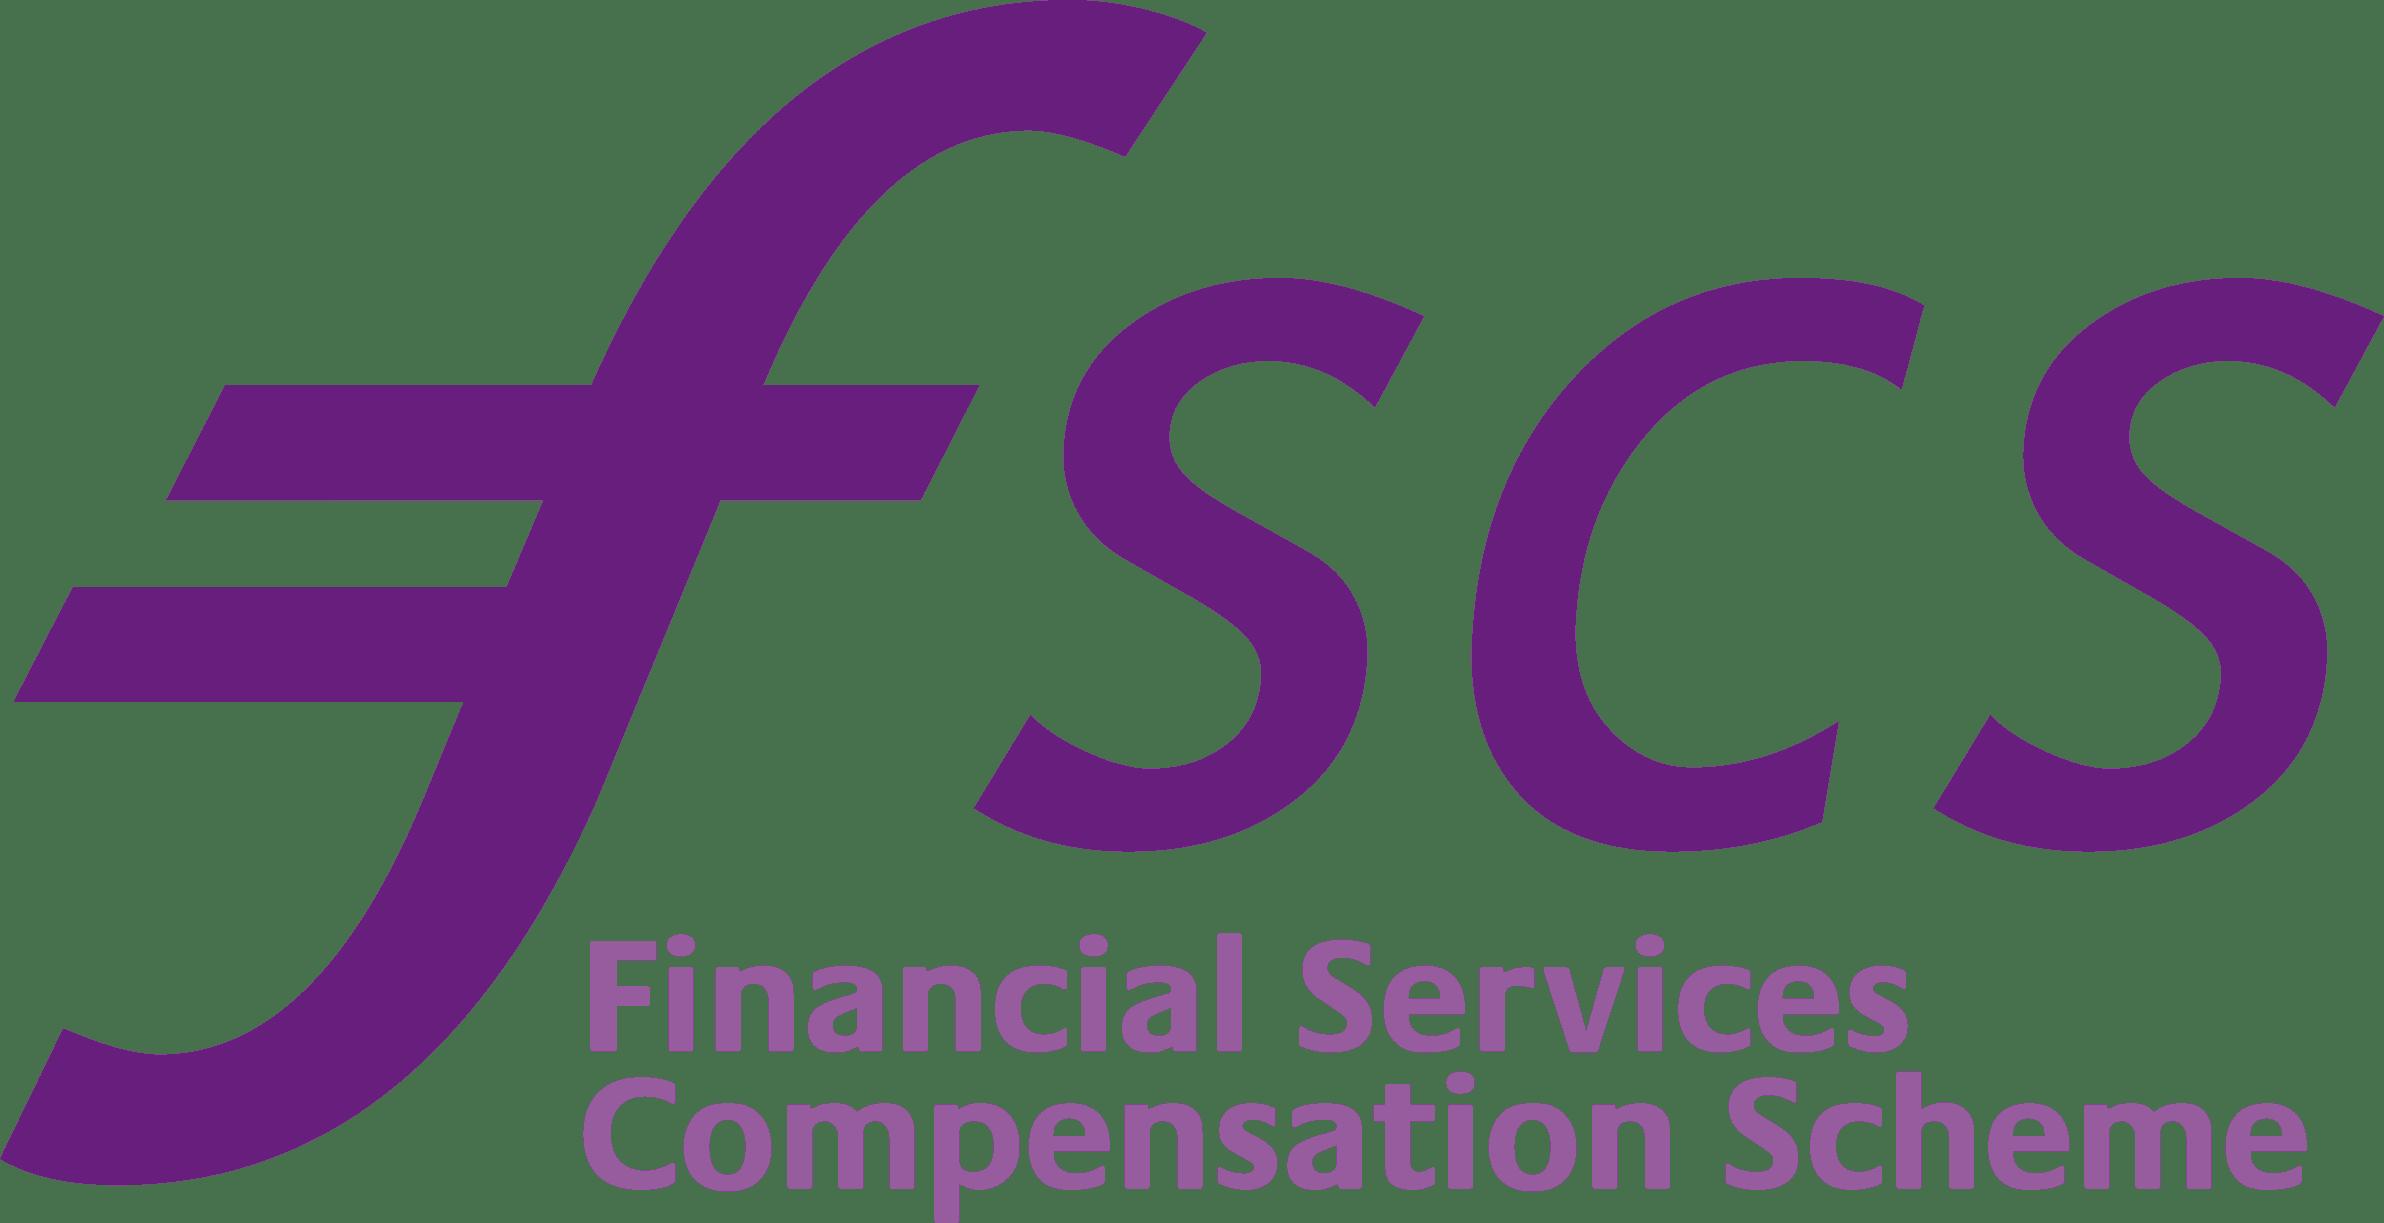 Financial Services Compensation Authority